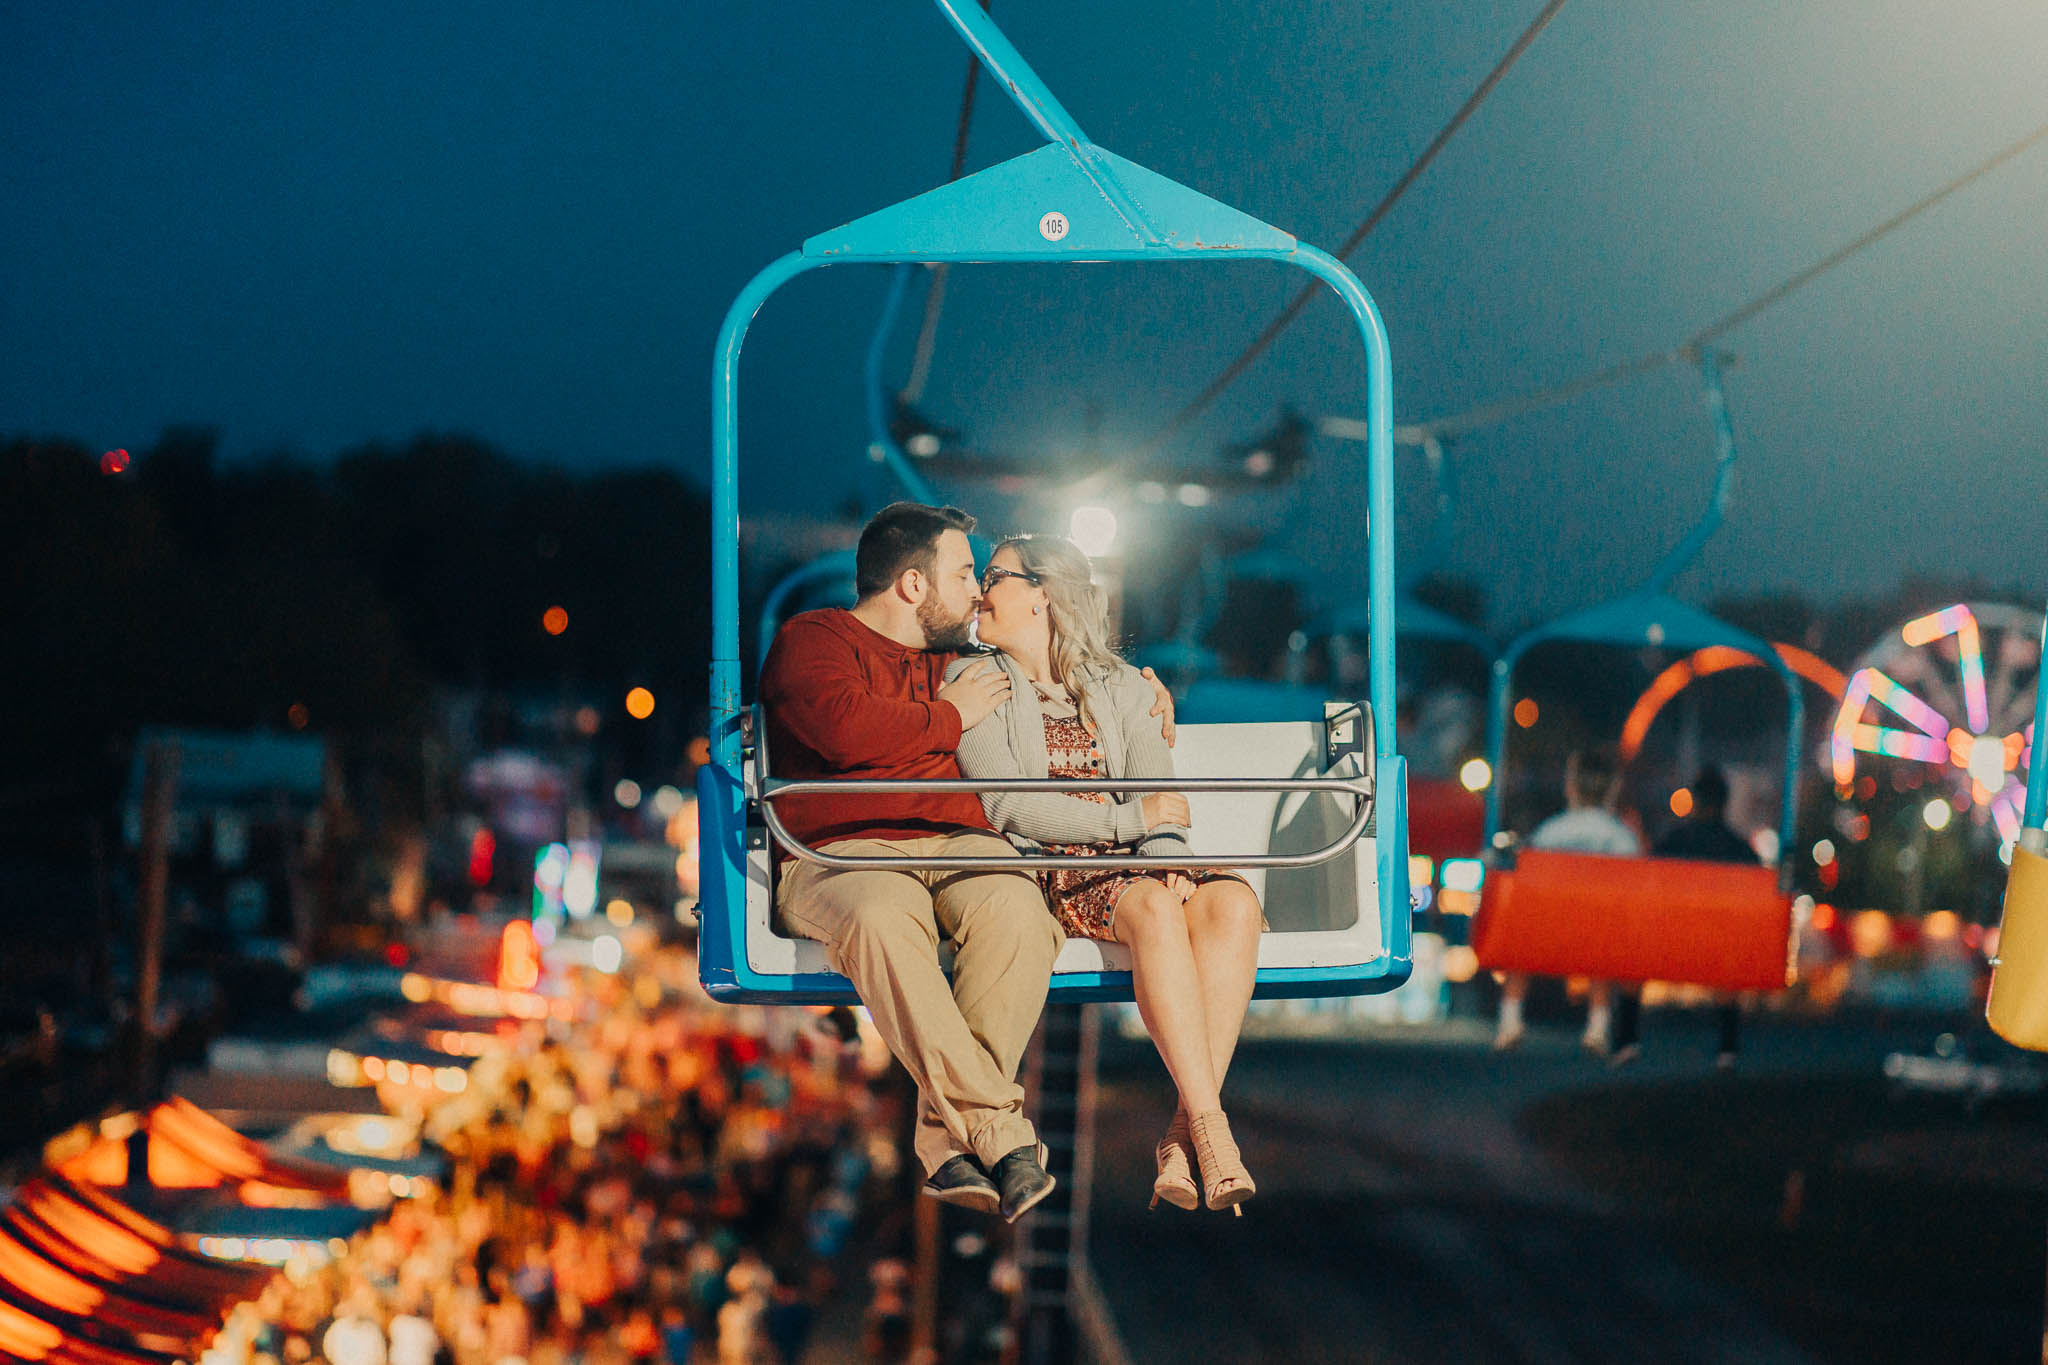 bloomsburg-fair-engagement-5610.jpg